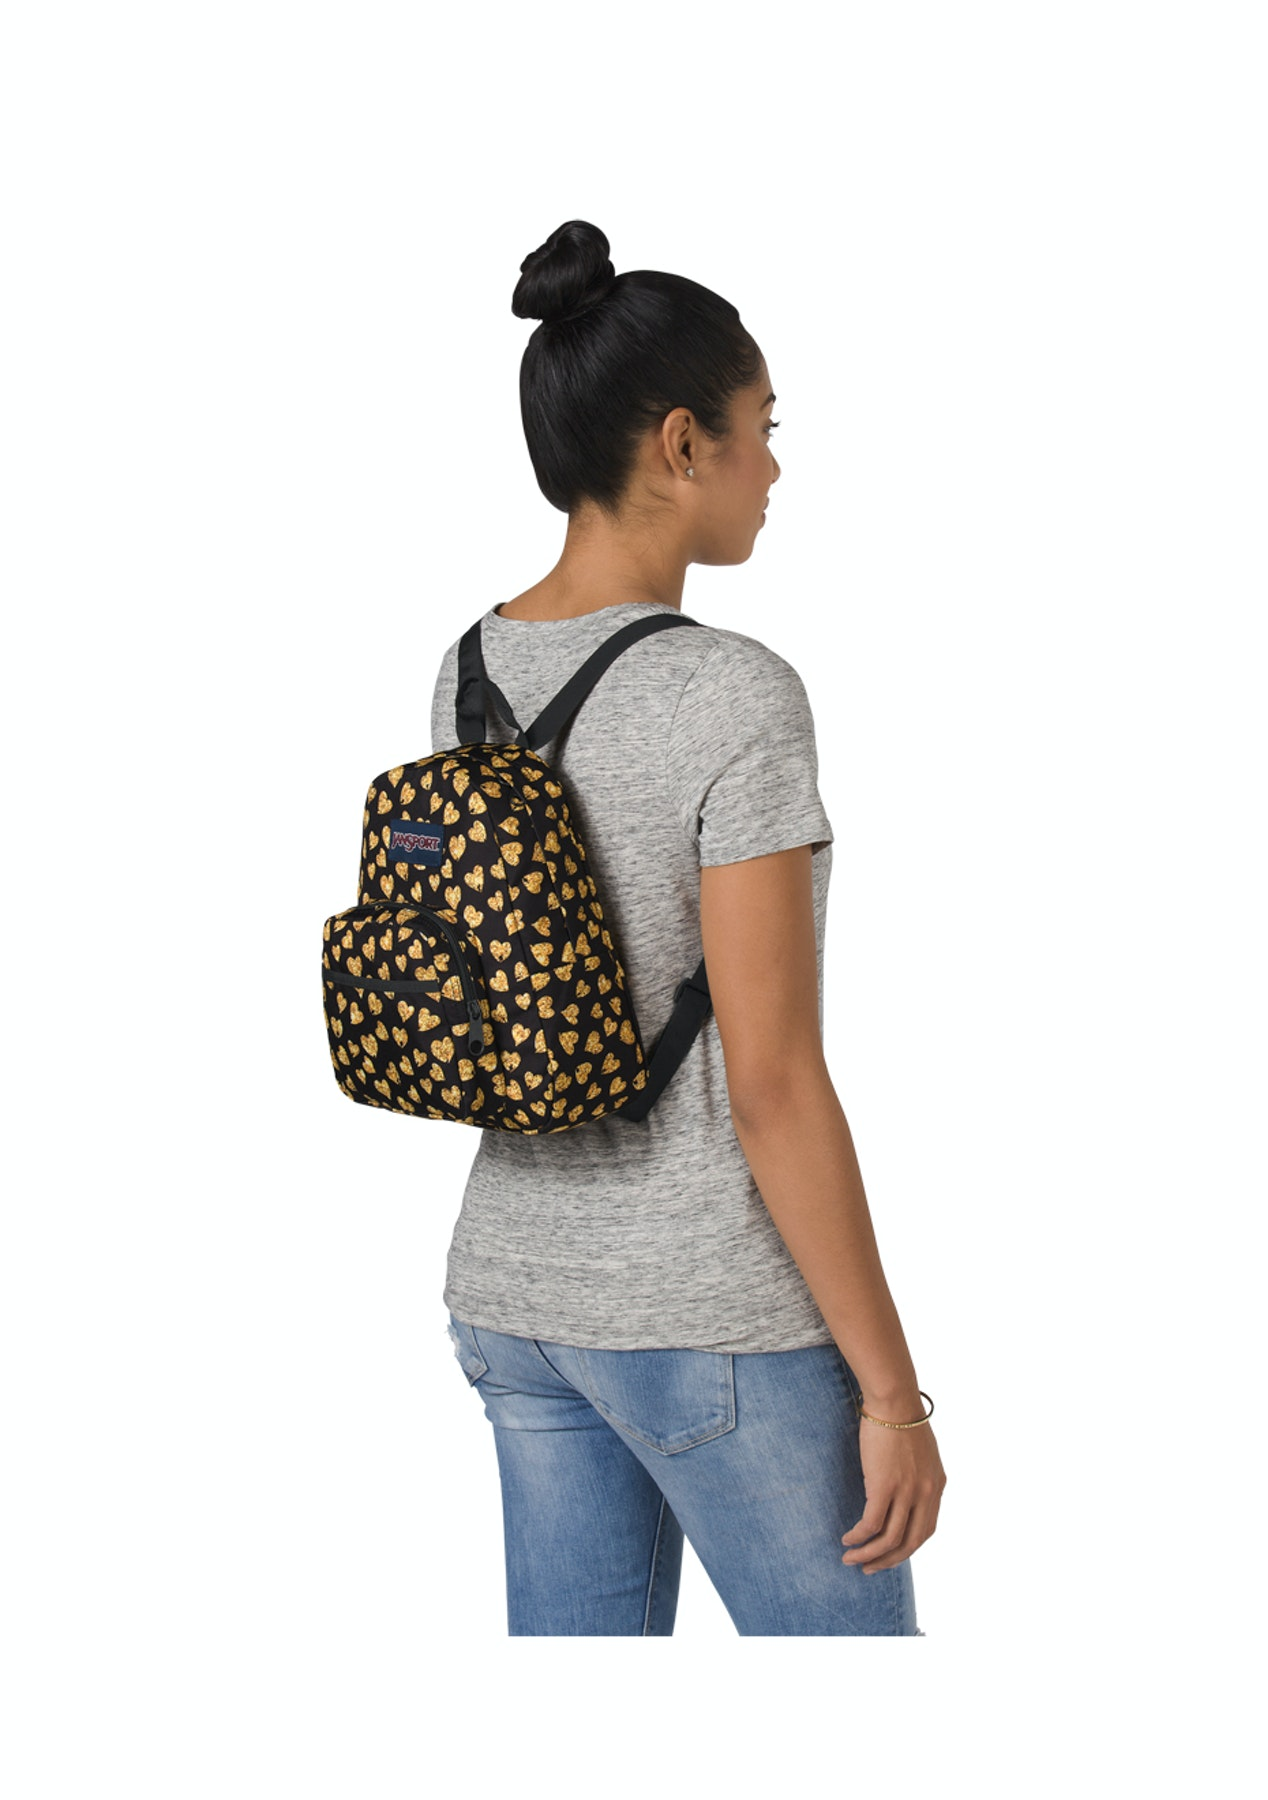 173e83dd5949 Jansport - Half Pint Glitter Hearts - 10.2L - Mi Pac   More Backpacks -  Onceit